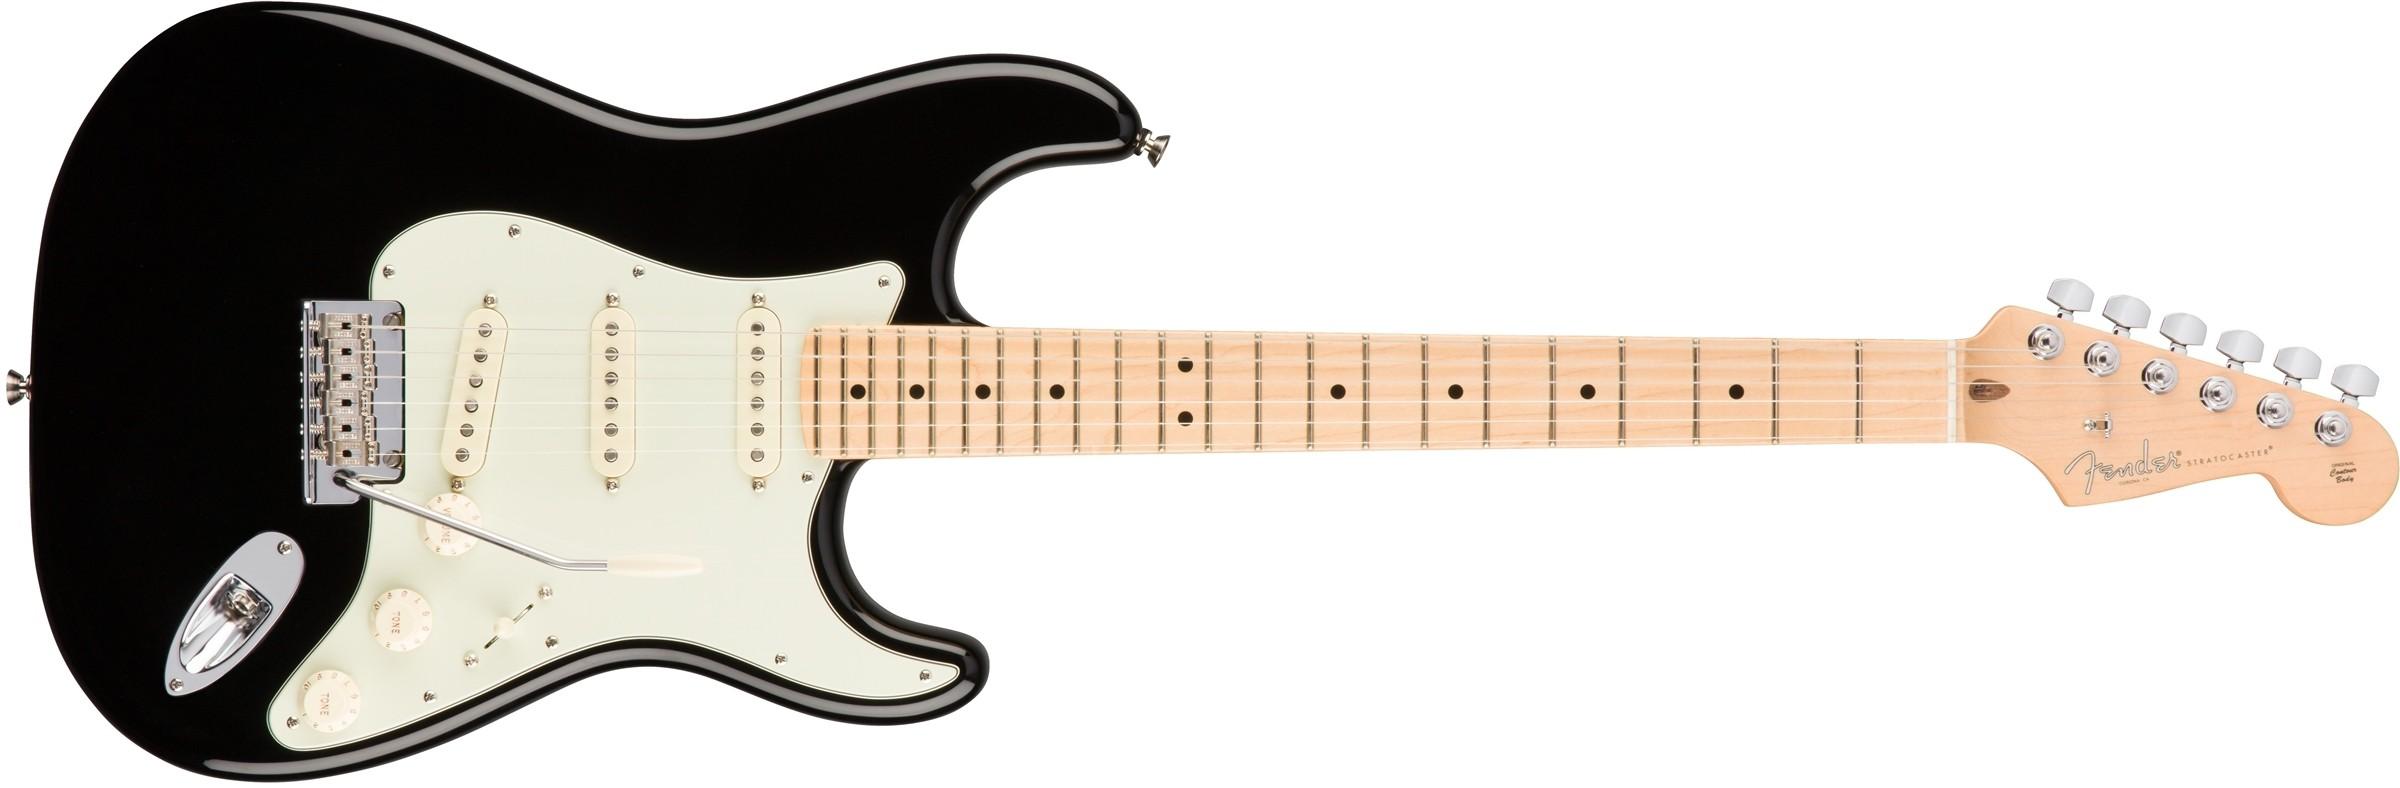 Fender American Professional Stratocaster - Black - Maple neck